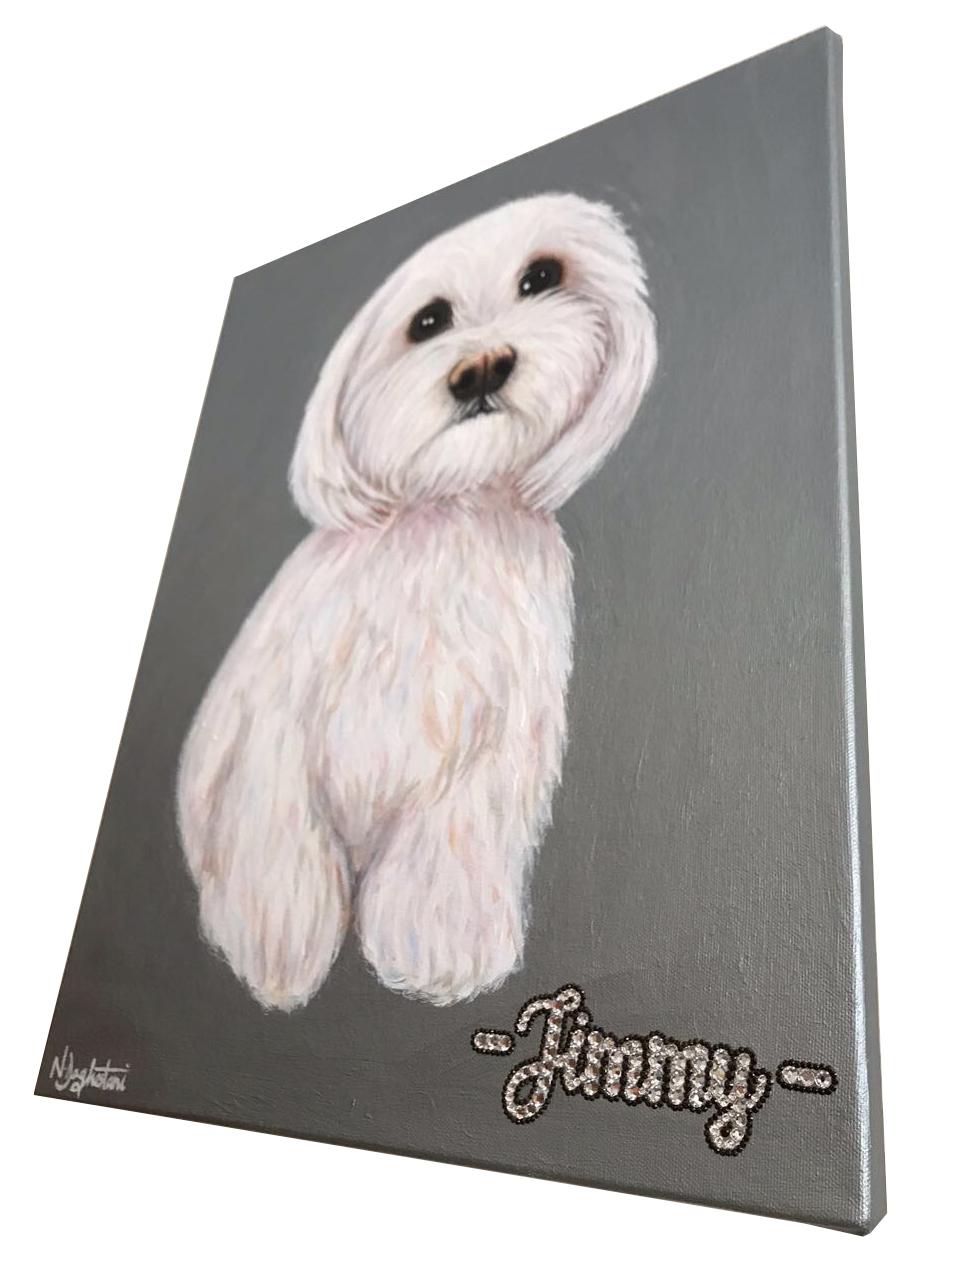 Jimmy Dog Pet Portrait Natalie Daghestani Art Dubai Artist6